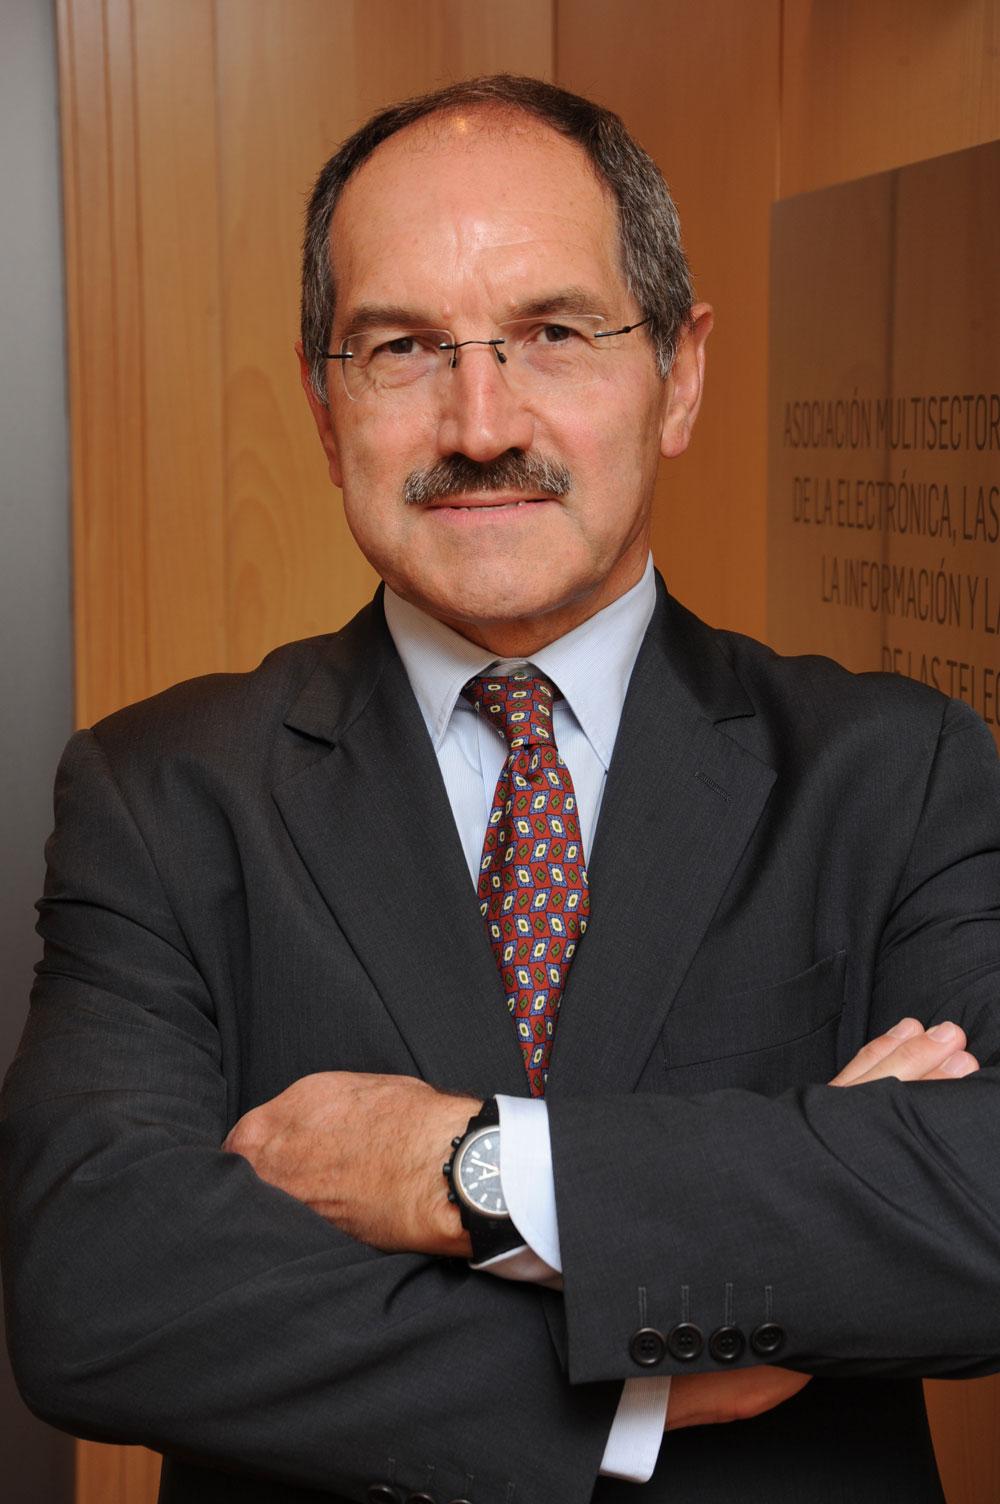 Pedro Mier